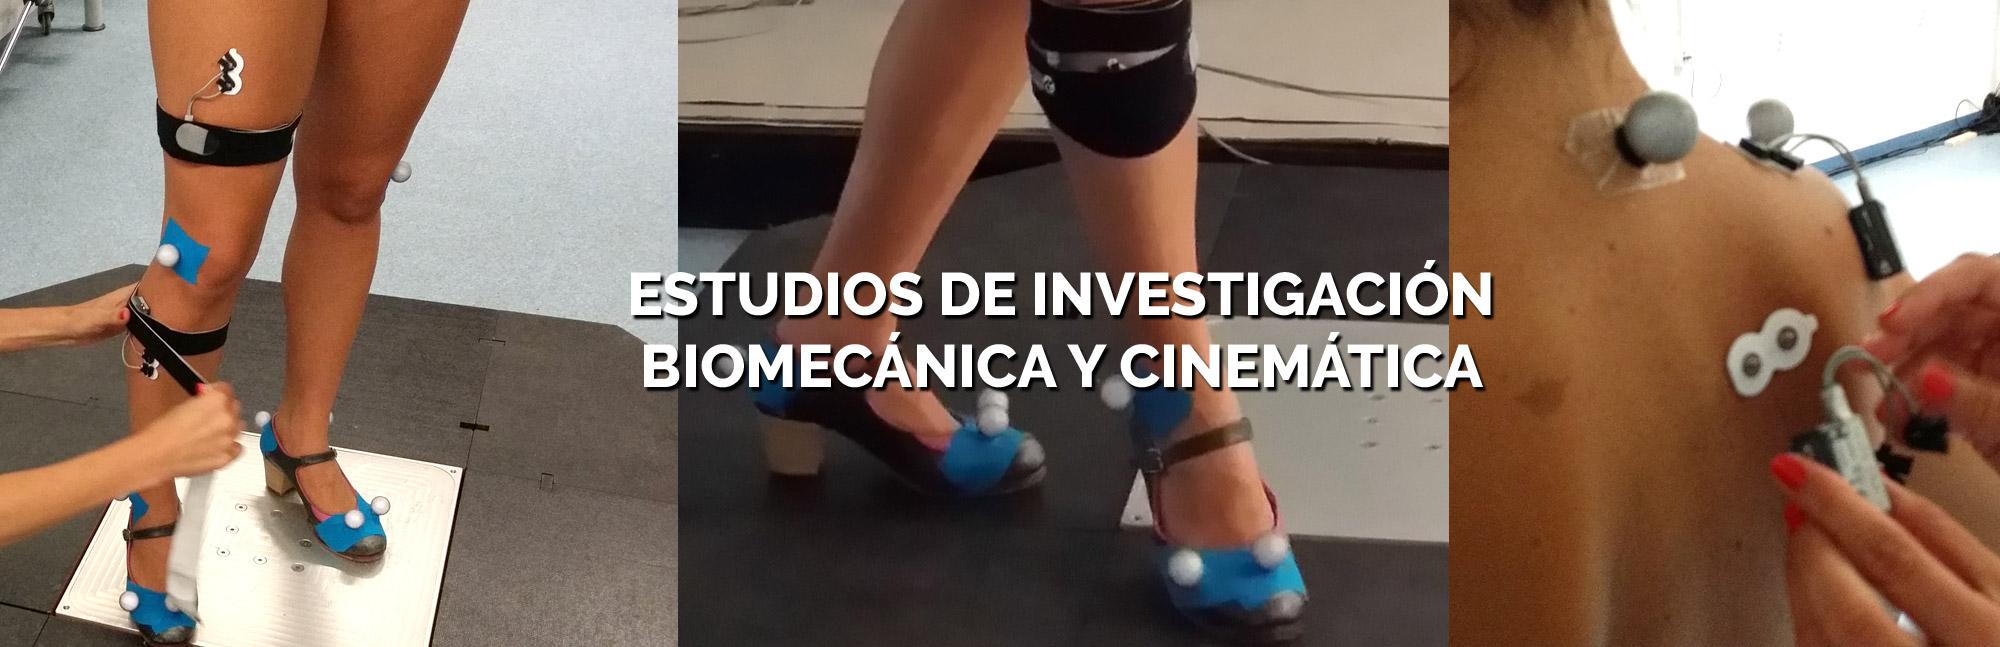 ESTUDIOS DE INVESTIGACION BIOMECANICA CINEMATICA